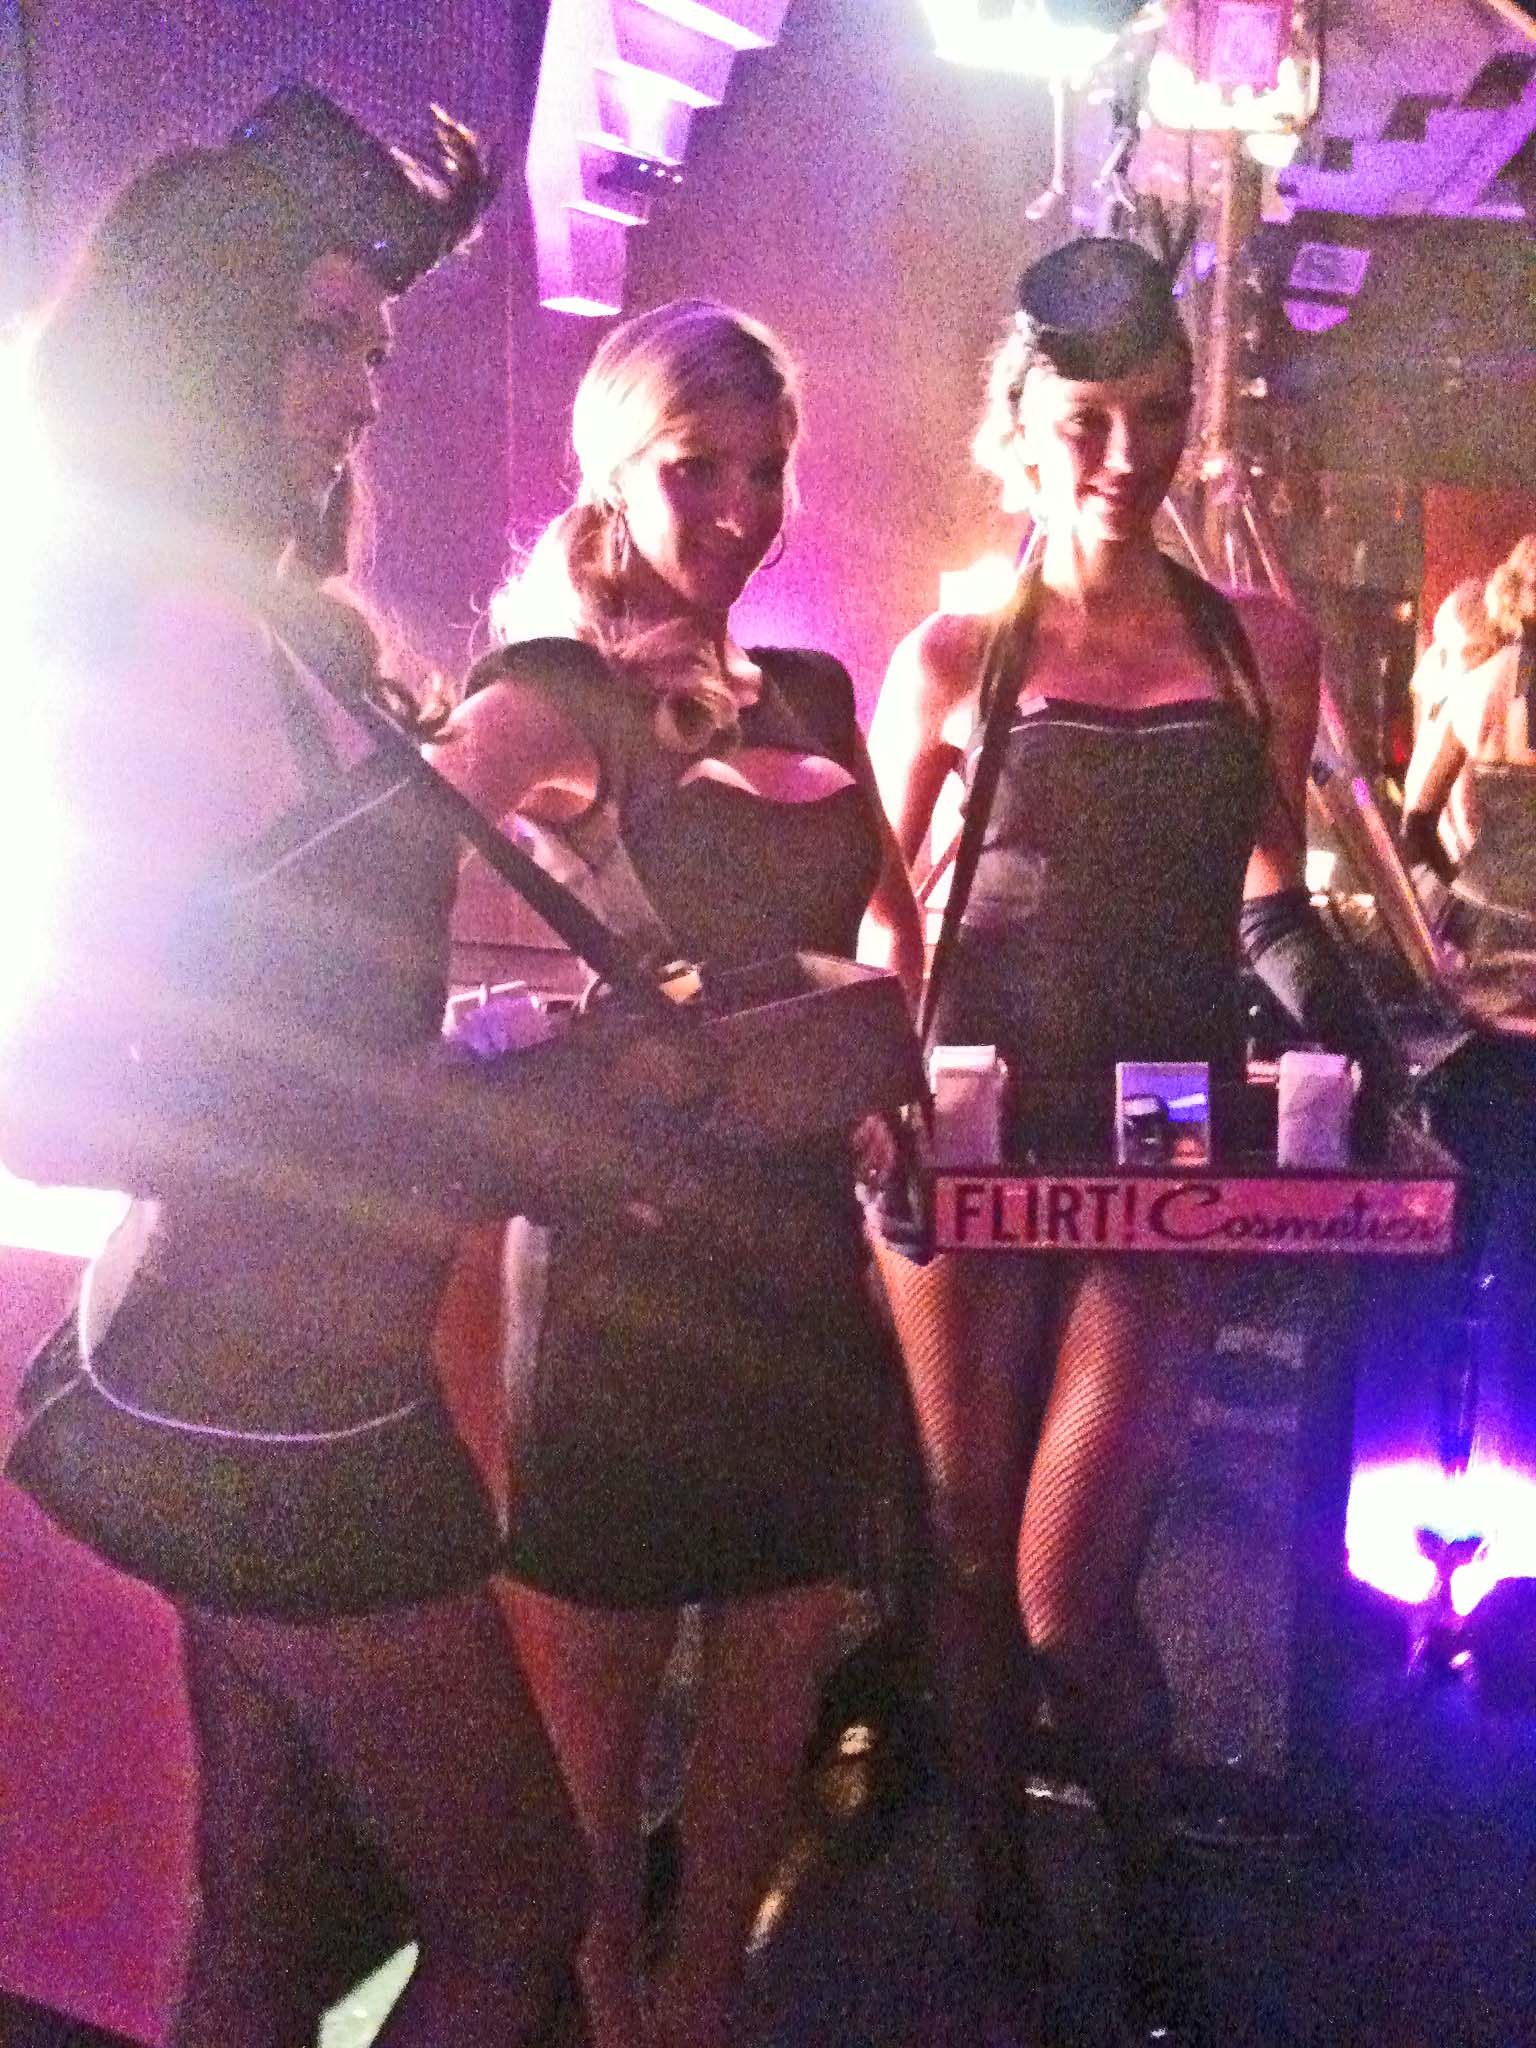 Costume branding candy girls